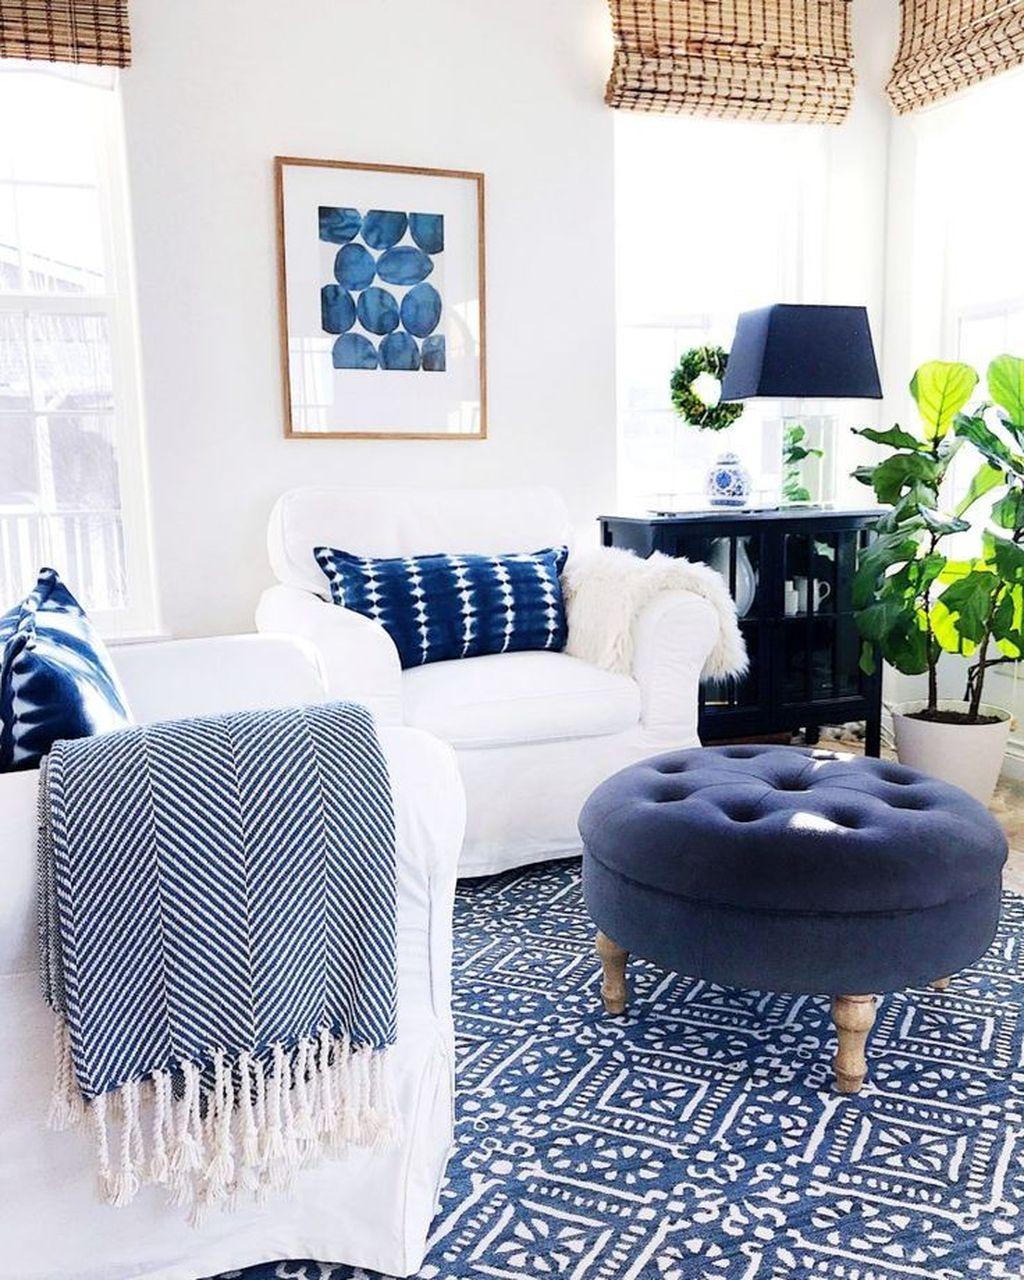 Enchanting Living Room Decor Ideas That Trending This Winter 35